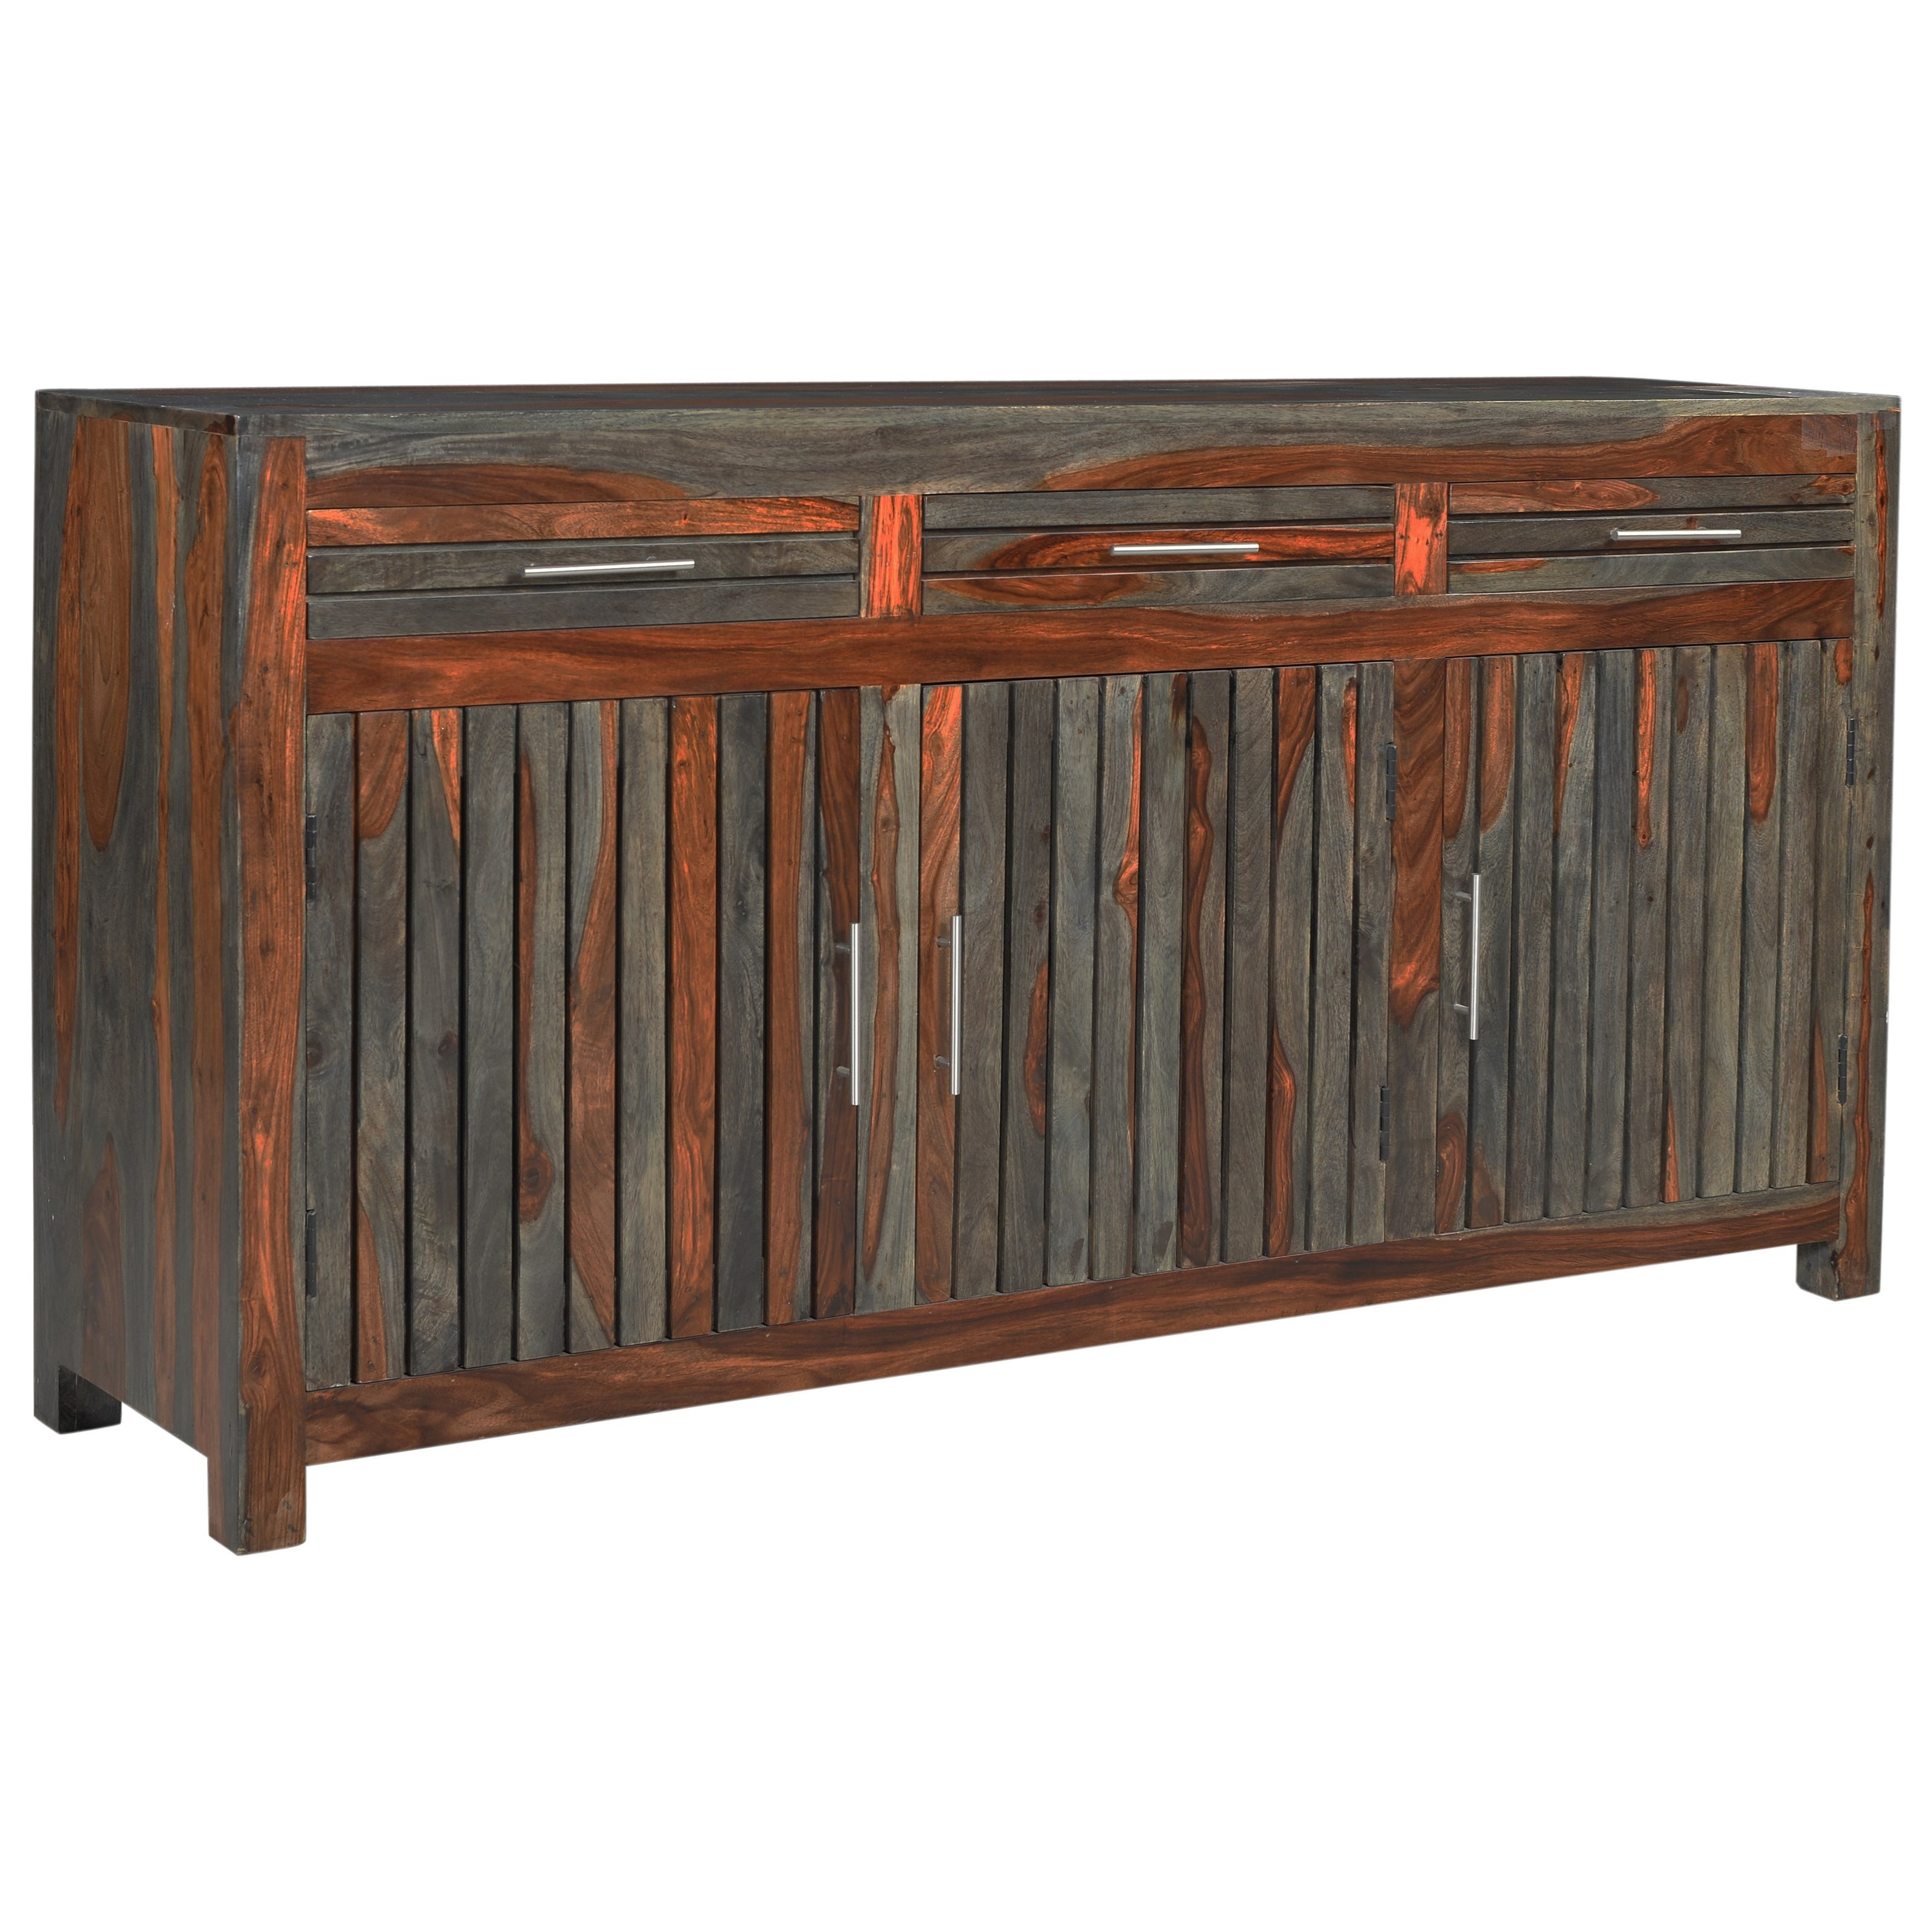 Capri Three Door Three Drawer Credenza by Coast to Coast Imports at Baer's Furniture